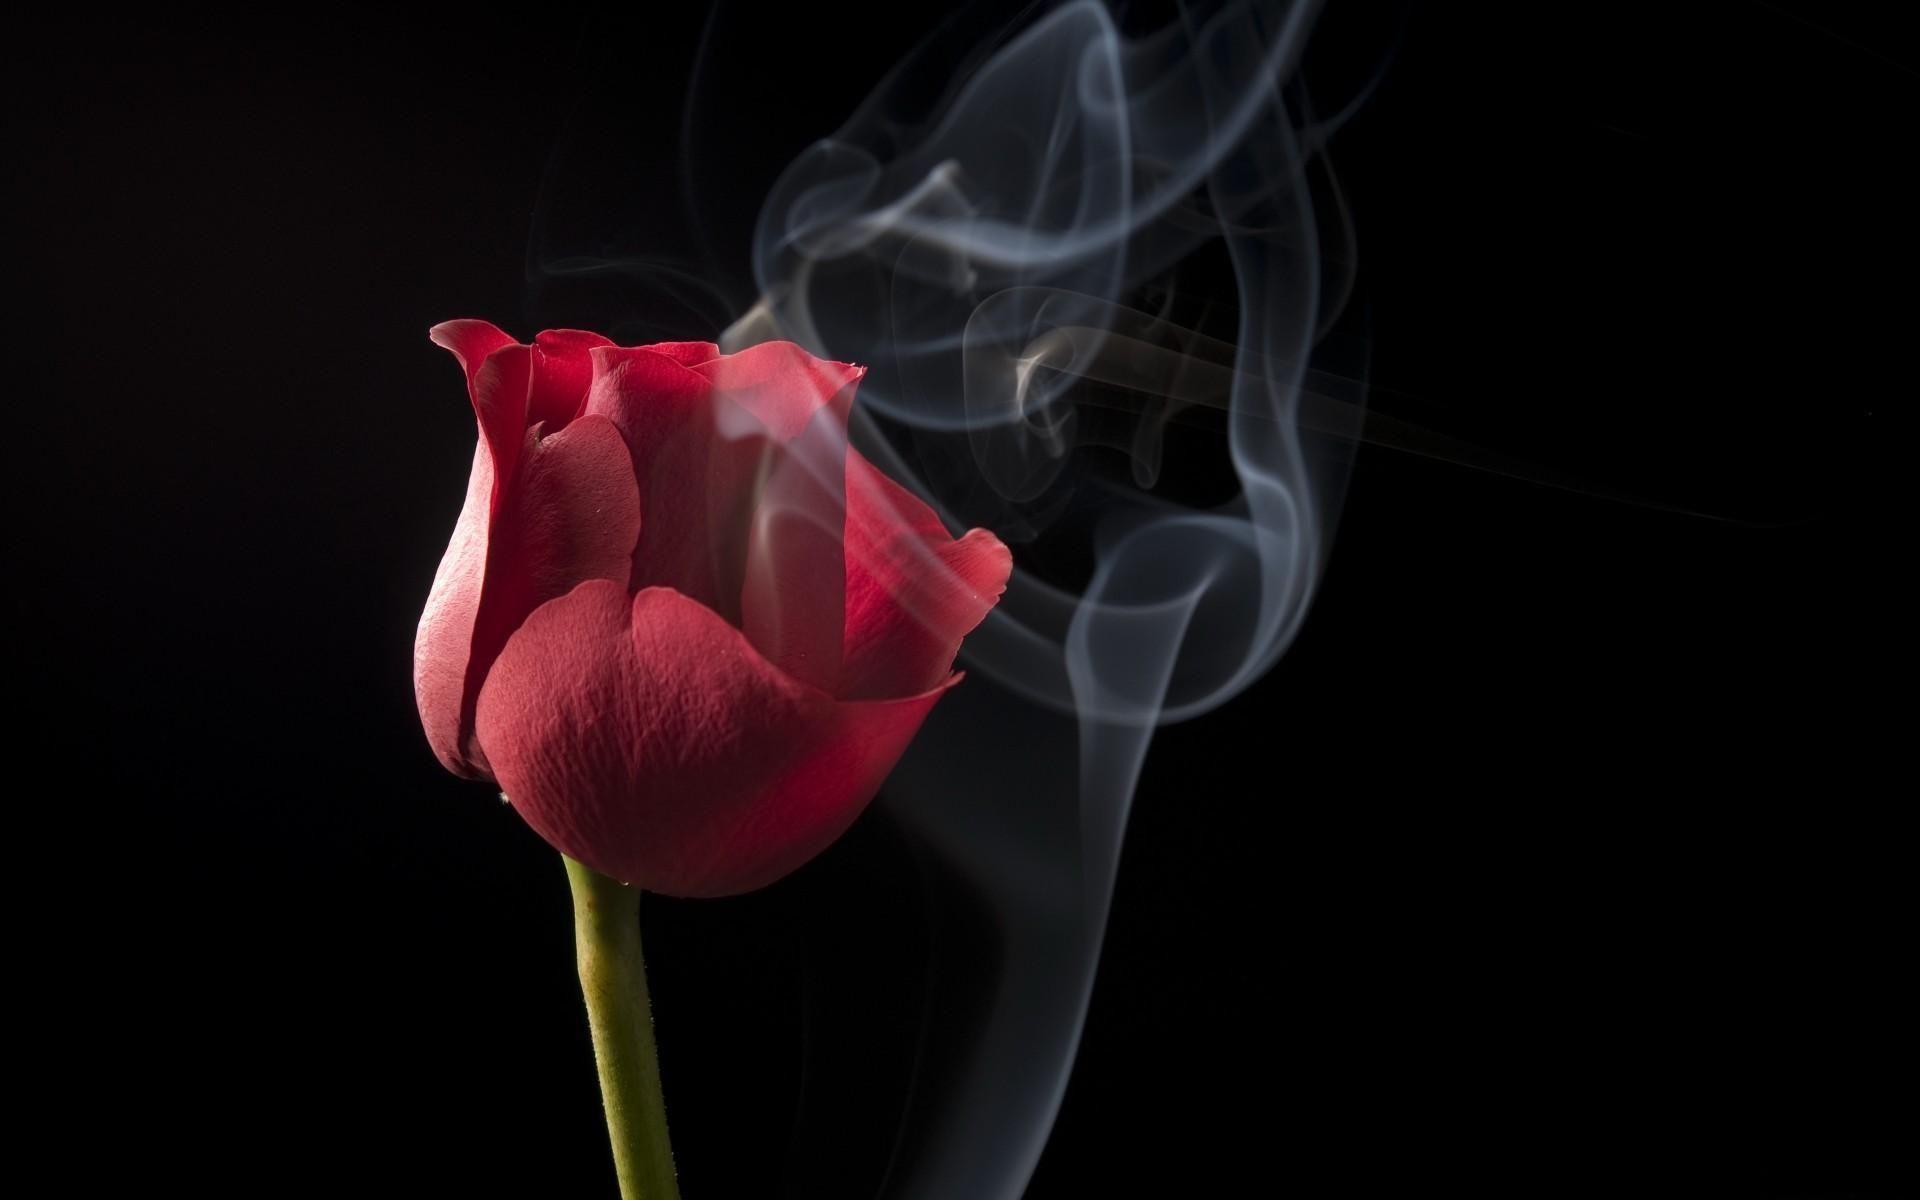 Wallpaper Bunga Mawar Hitam Hd Wallpaper Naik Asap Hitam Hd Background Layar Lebar Definisi Wallpaper Bunga Mawar Merah 34 Di 2020 Wallpaper Bunga Bunga Mawar Ungu